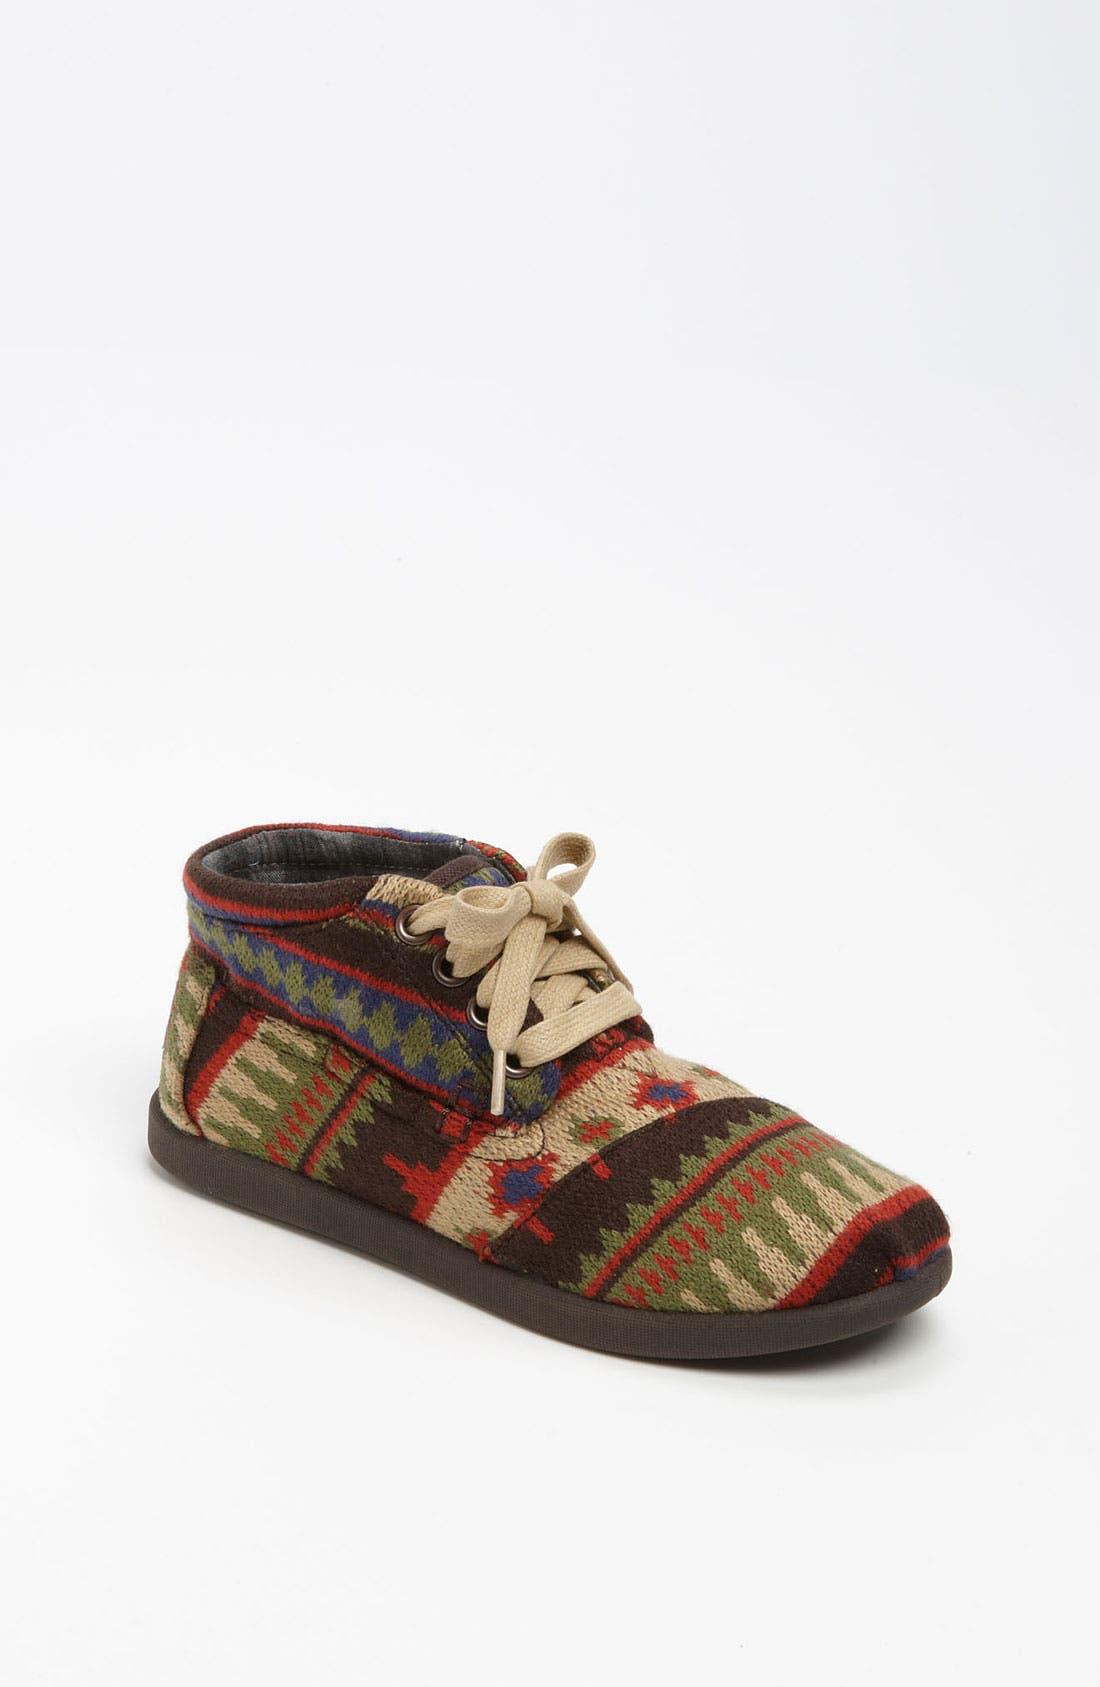 Main Image - TOMS 'Botas Youth - Kilim' Boot (Toddler, Little Kid & Big Kid)